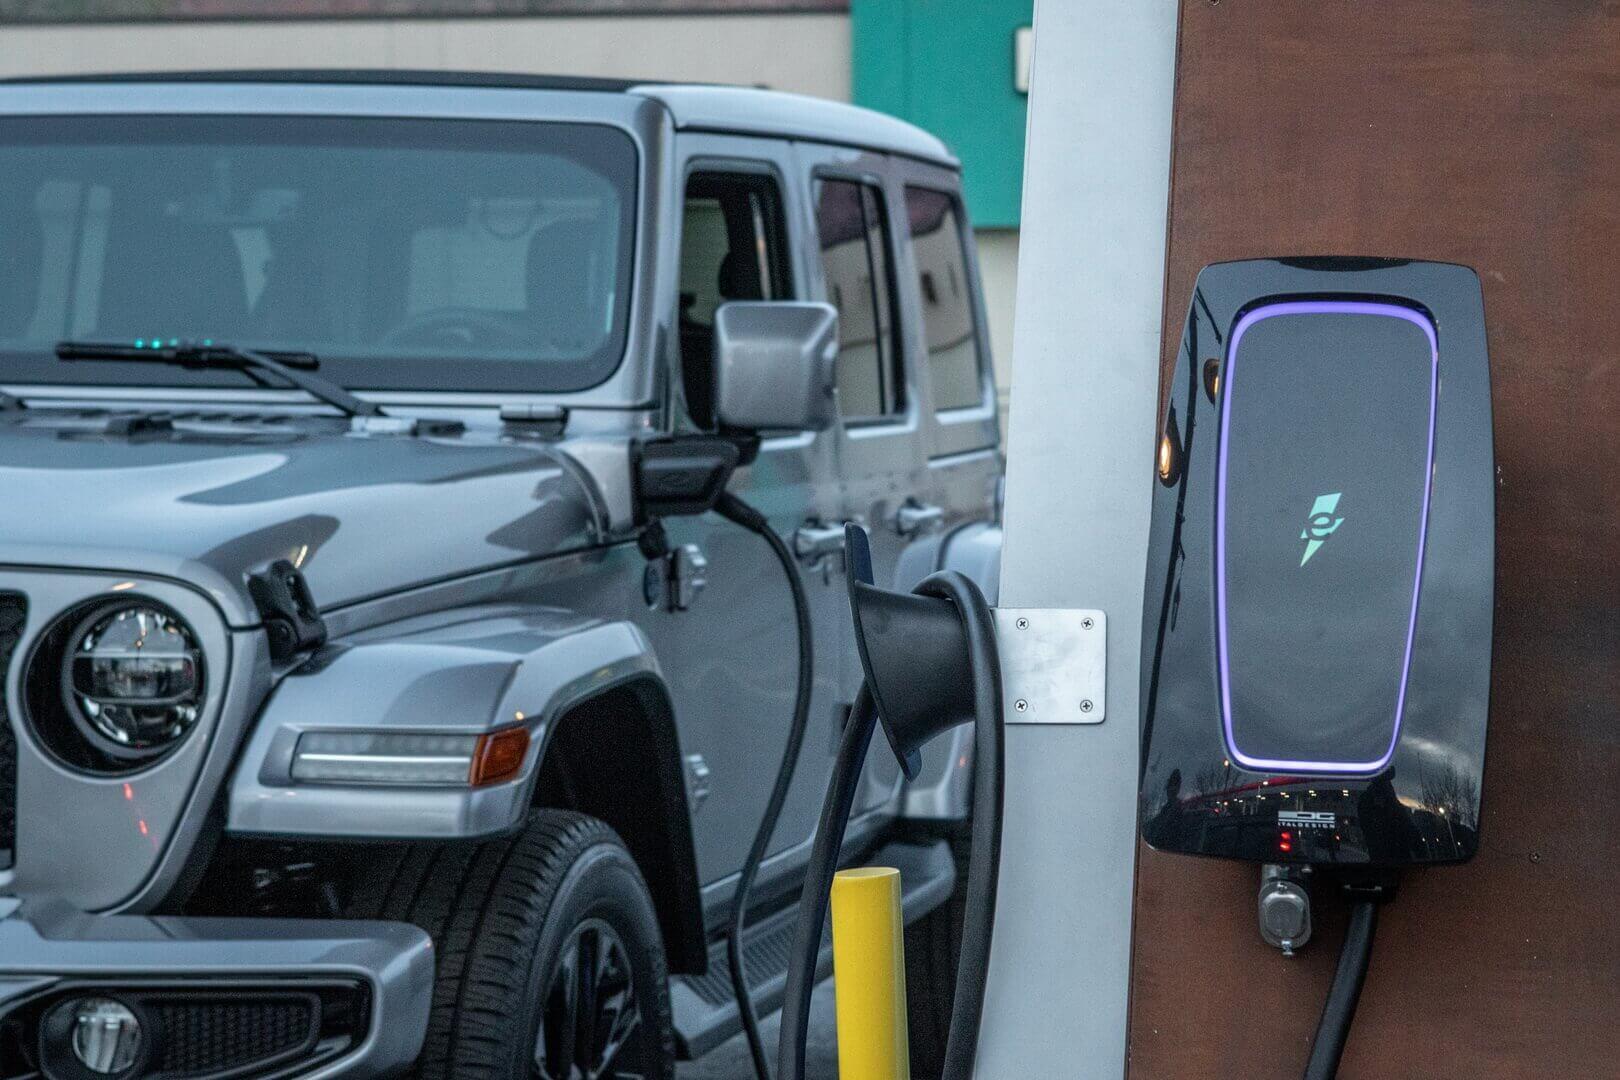 Плагин-гибрид Jeep Wrangler 4xe на зарядке